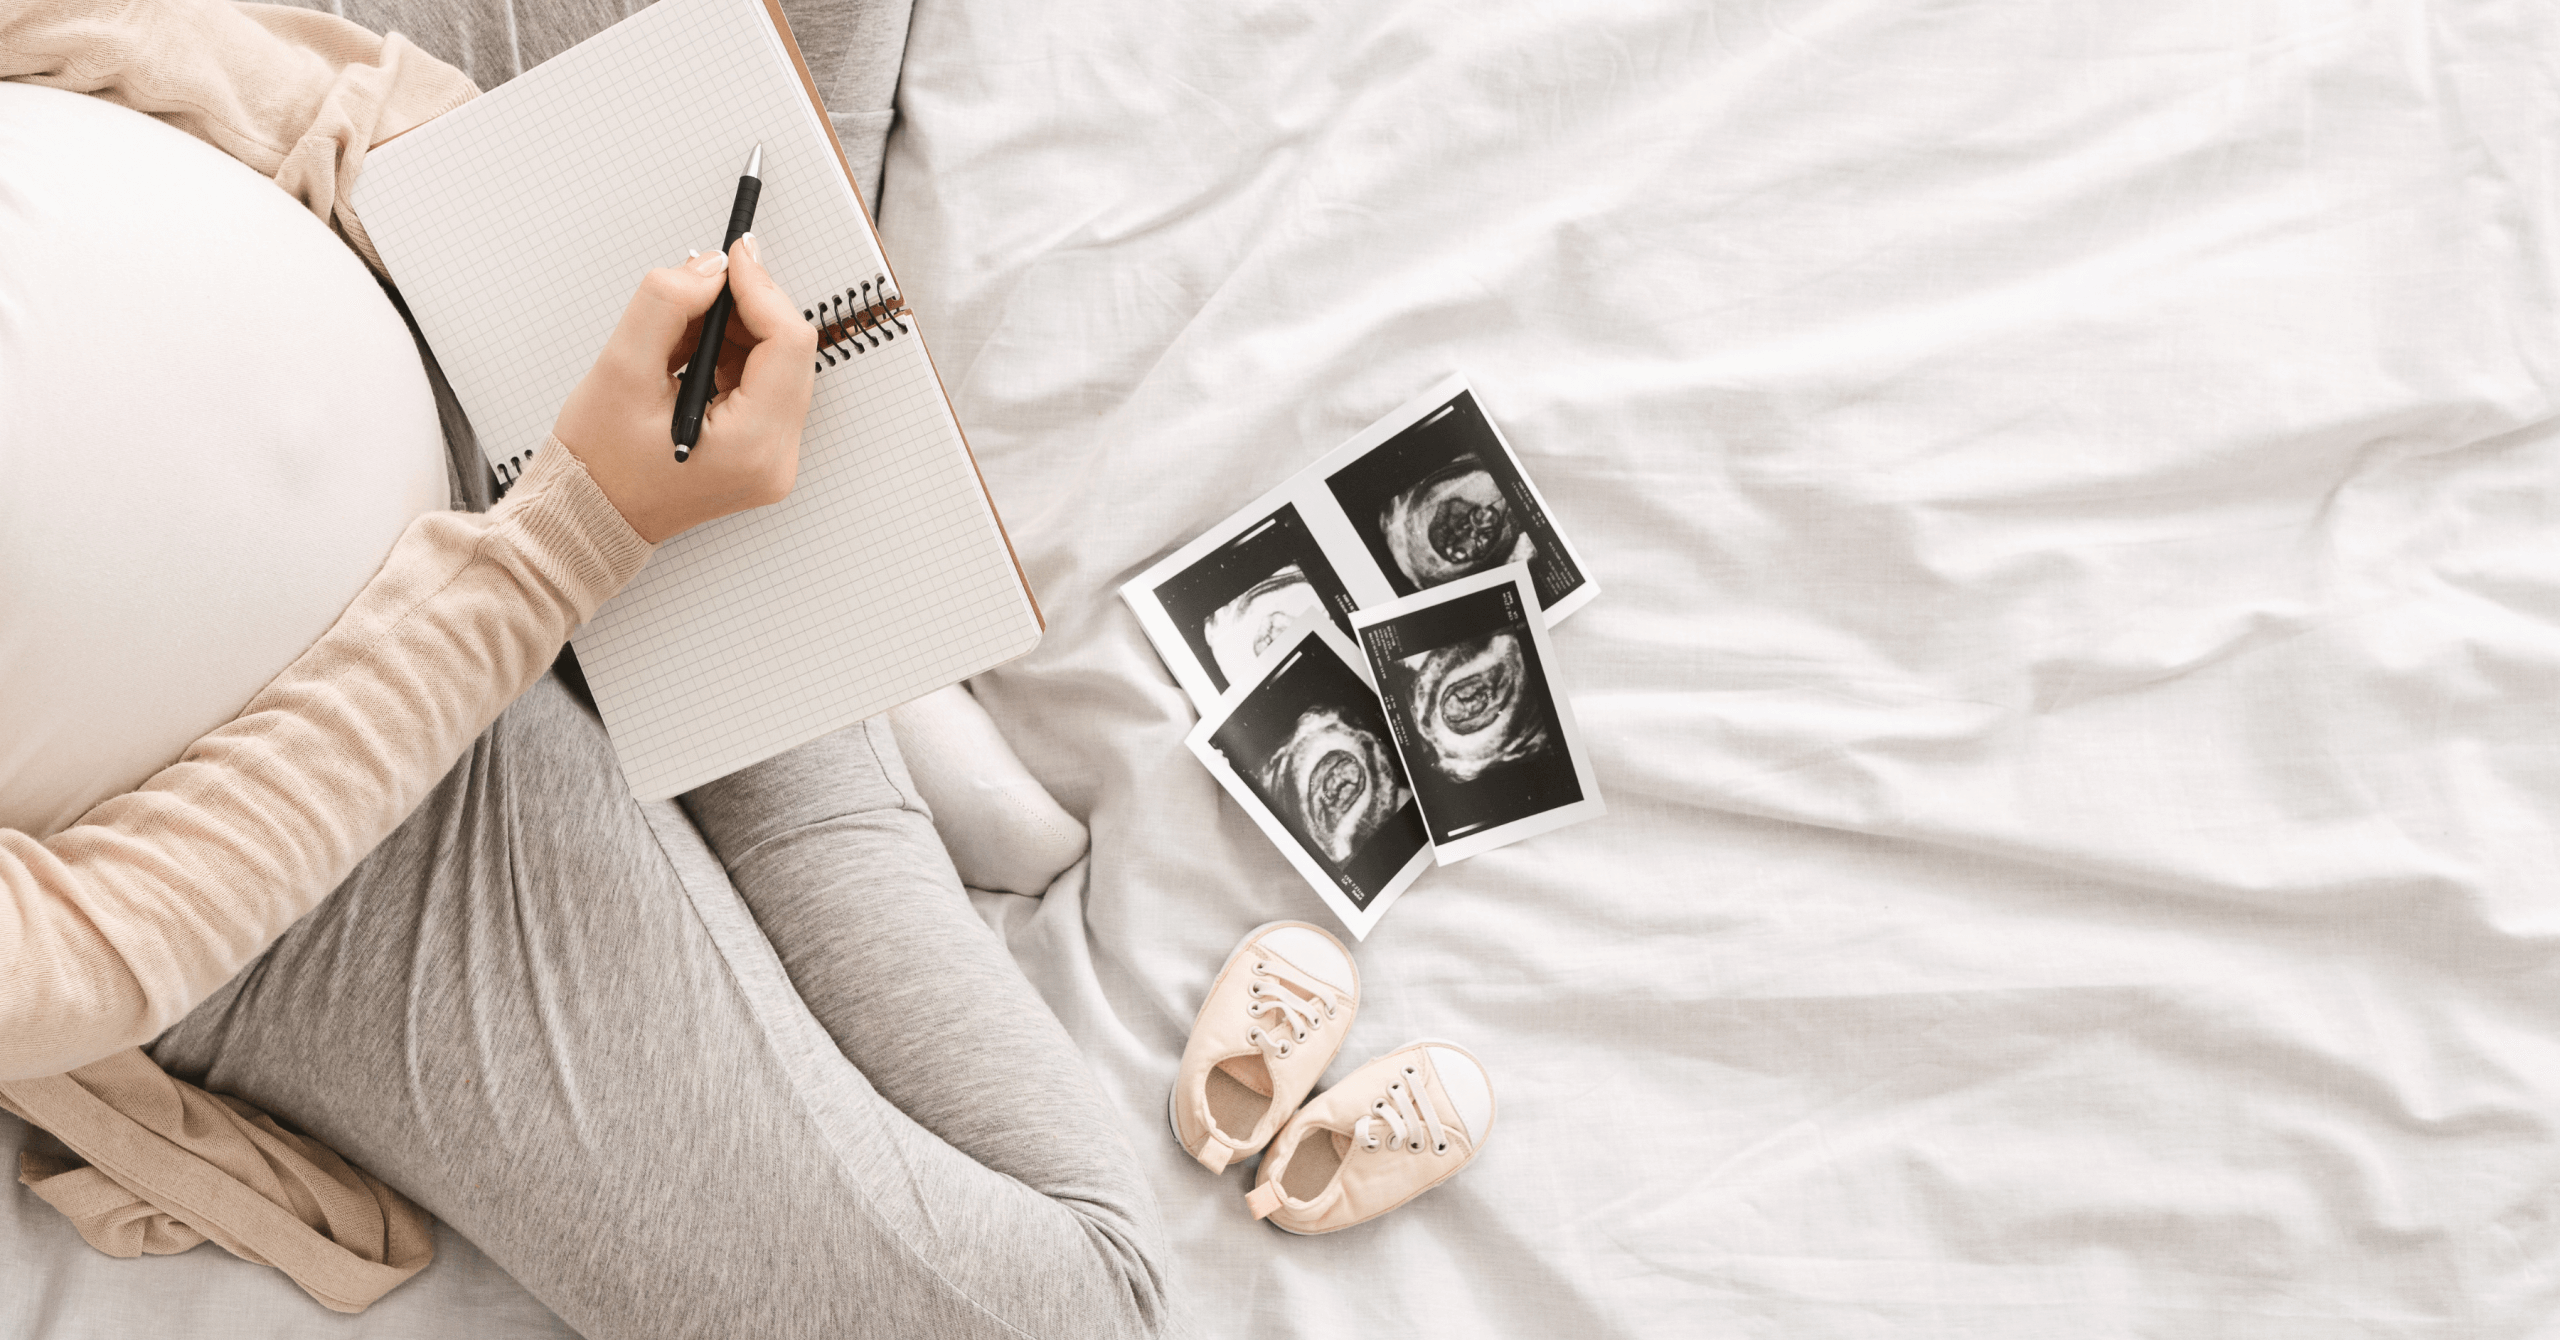 Nanny Maternity Leave | Nannytax